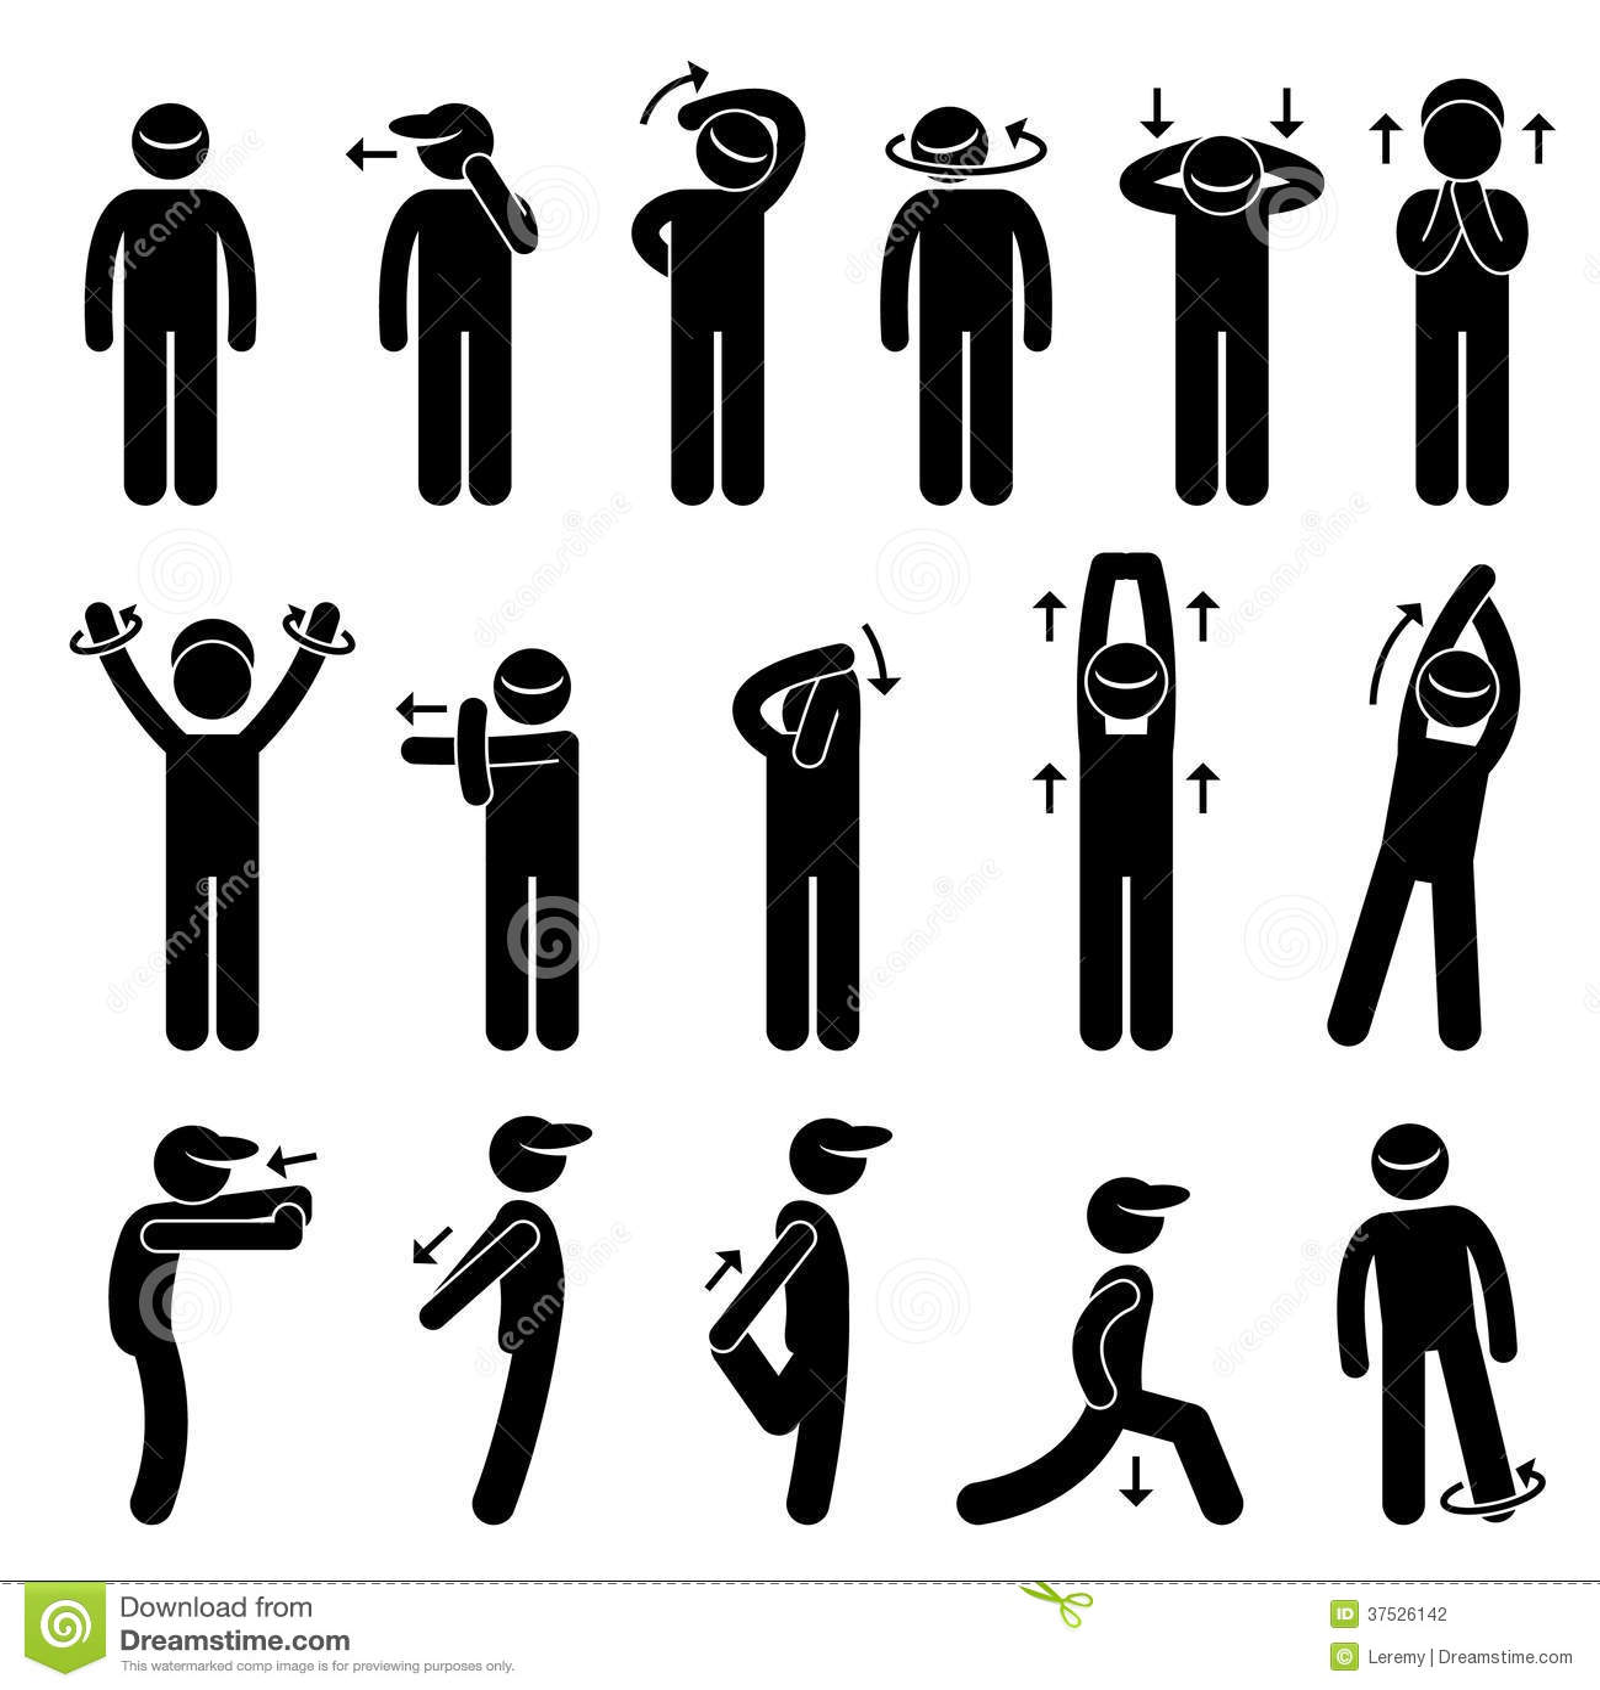 Body Stretching Exercise Stick Figure Pictogram Ic Stock